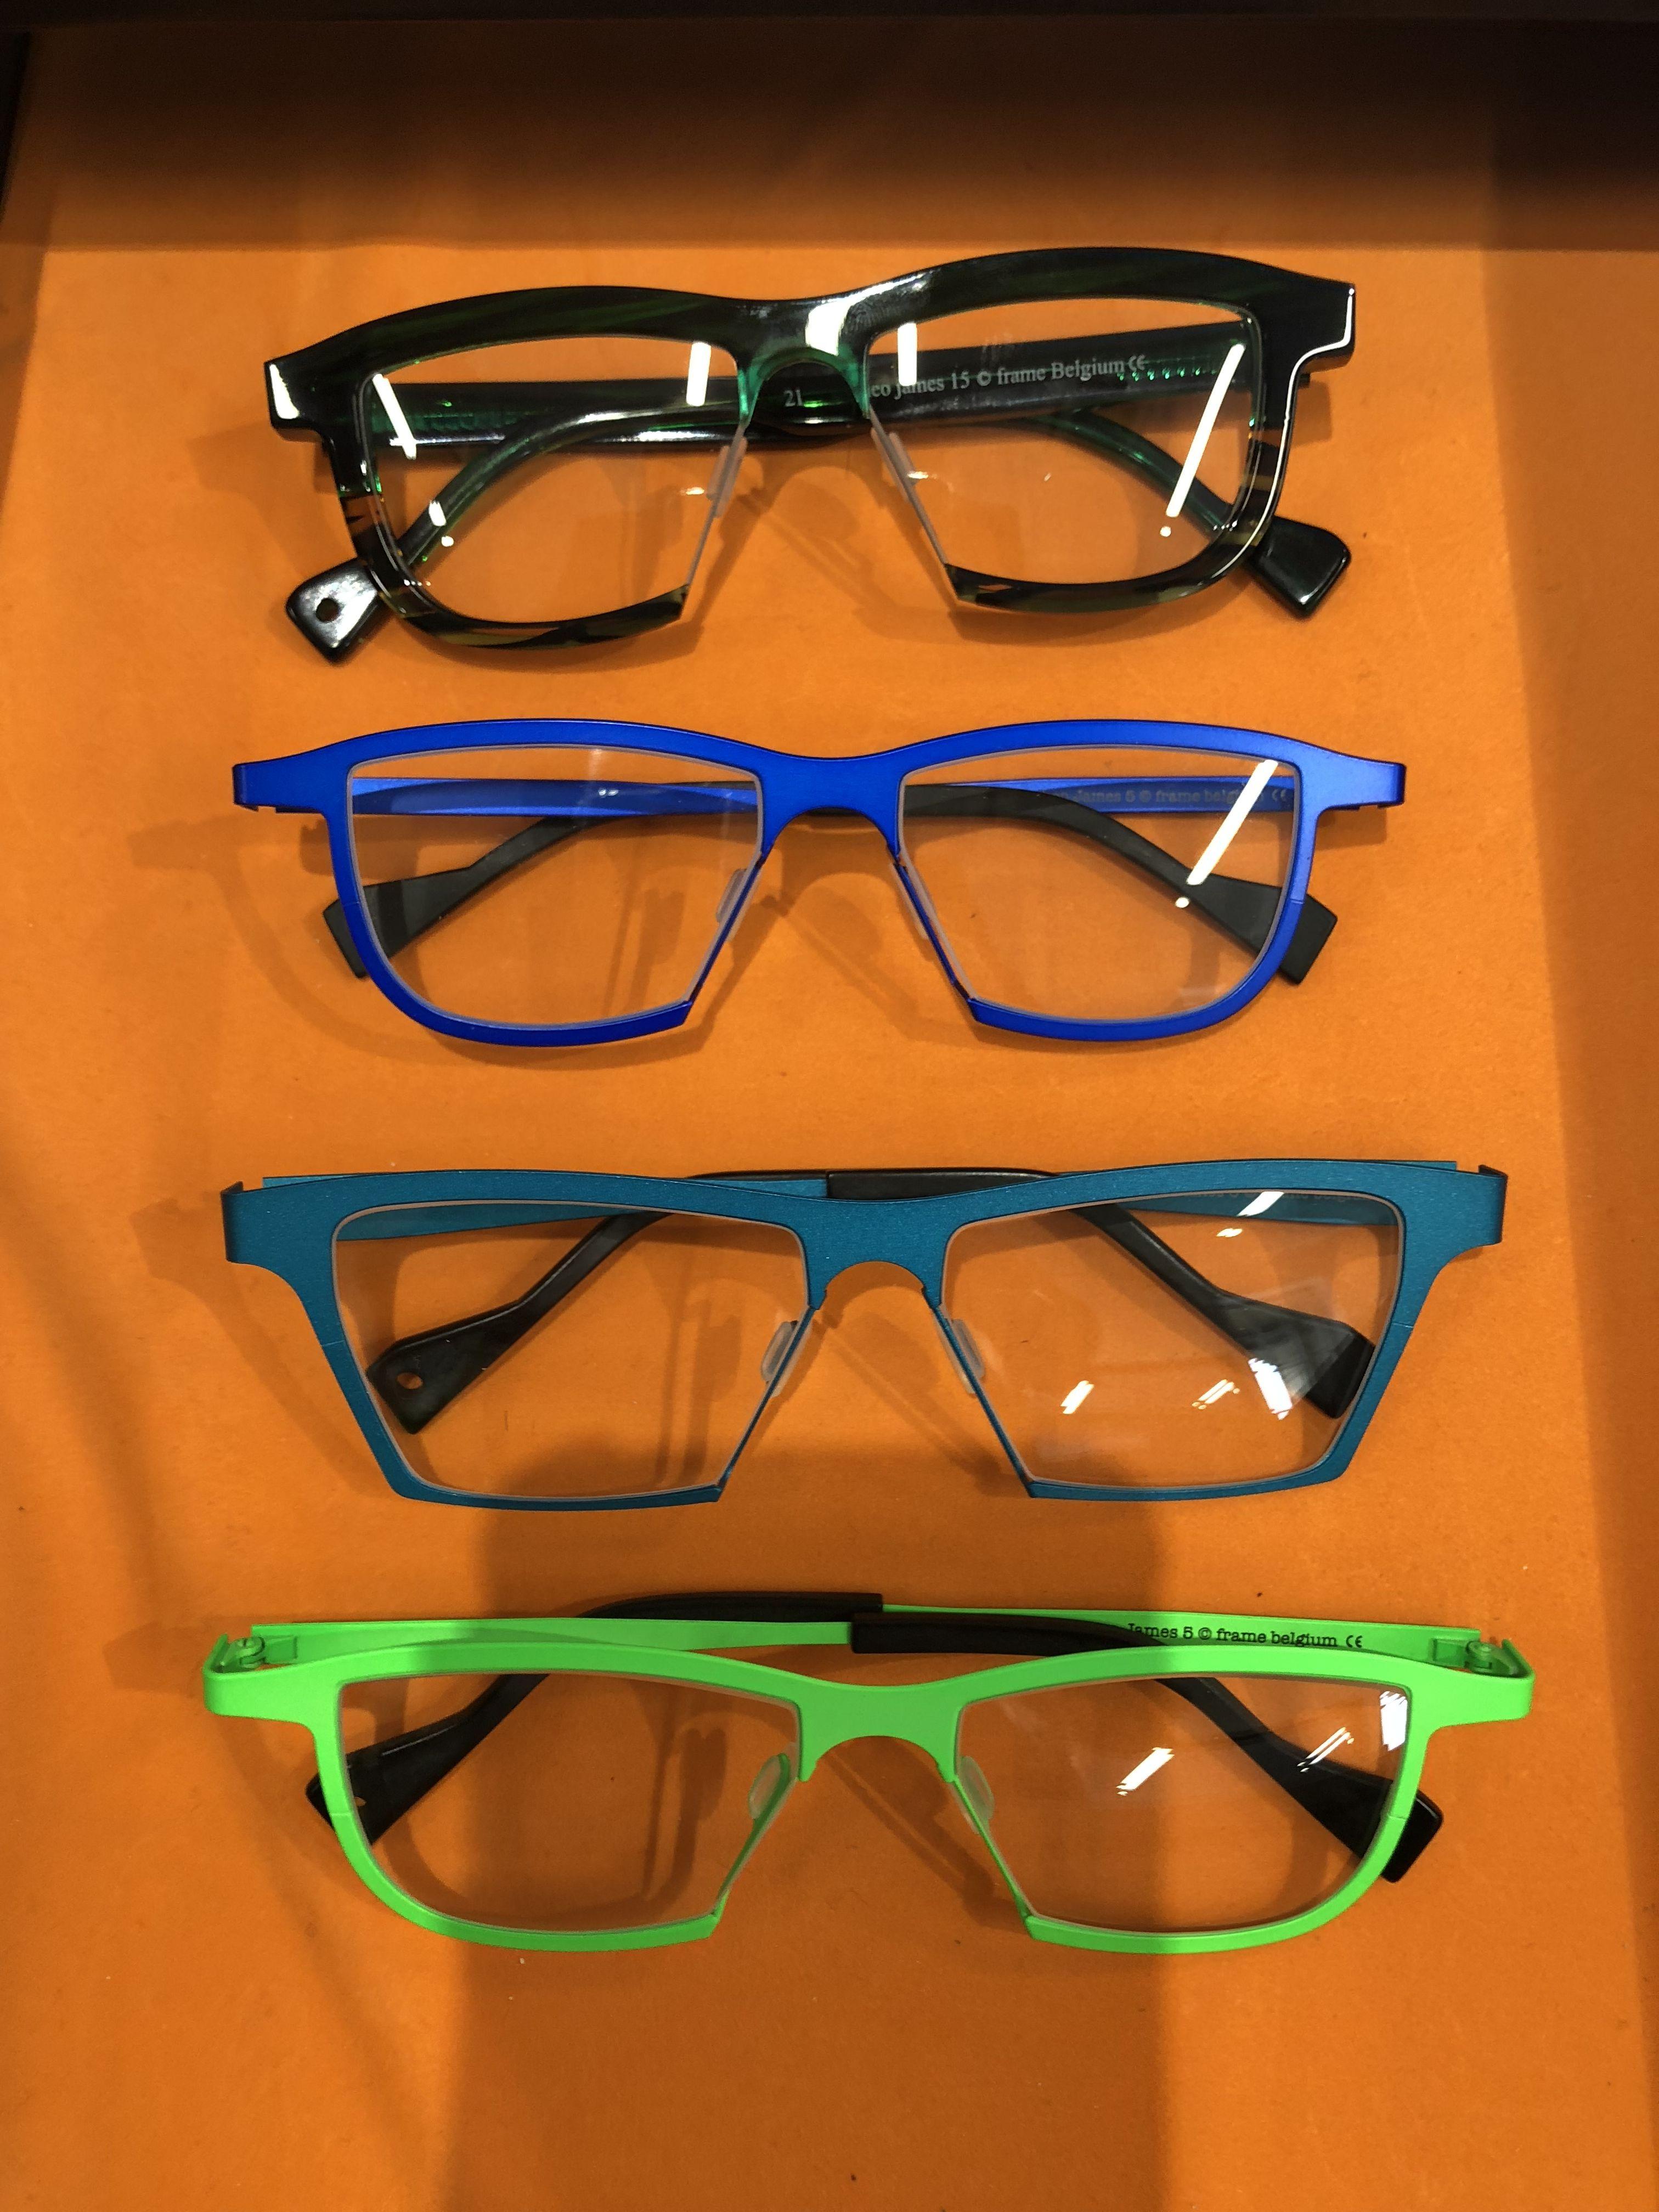 New Theo Eyewear Eyewear, Glasses, Sunglasses